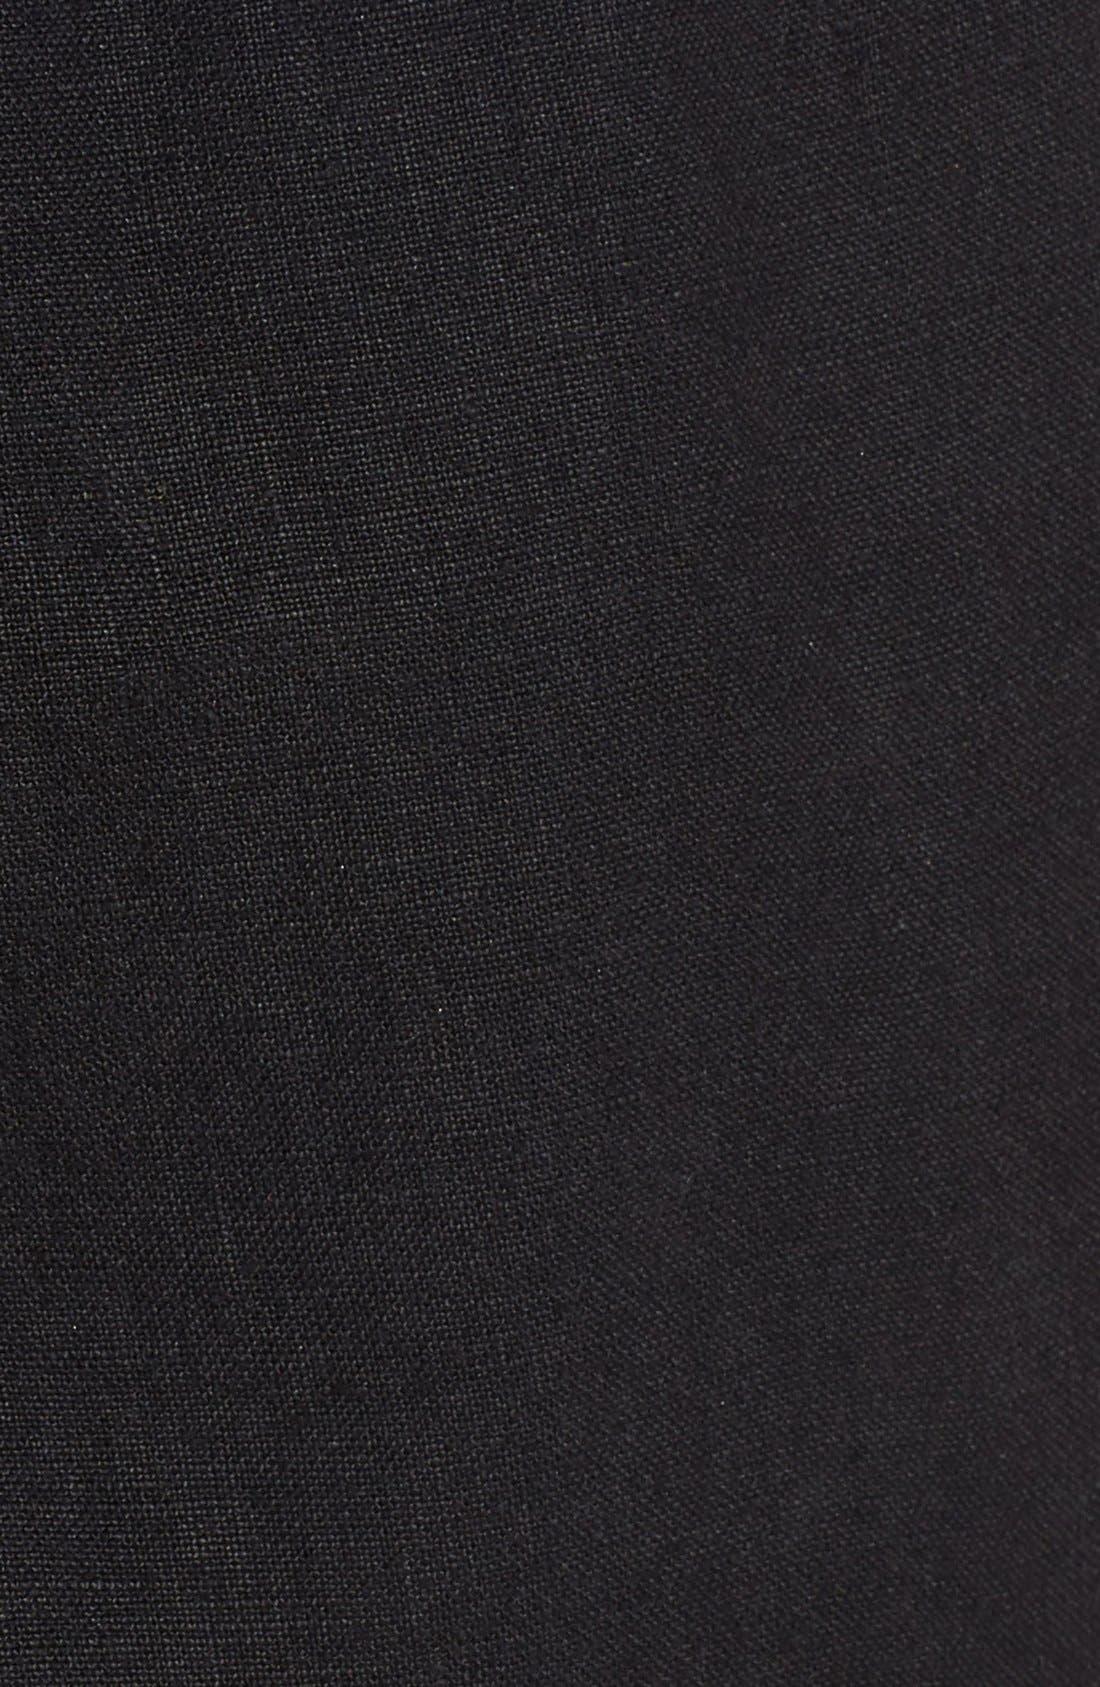 Vilbrequin Linen Cargo Shorts,                             Alternate thumbnail 5, color,                             001